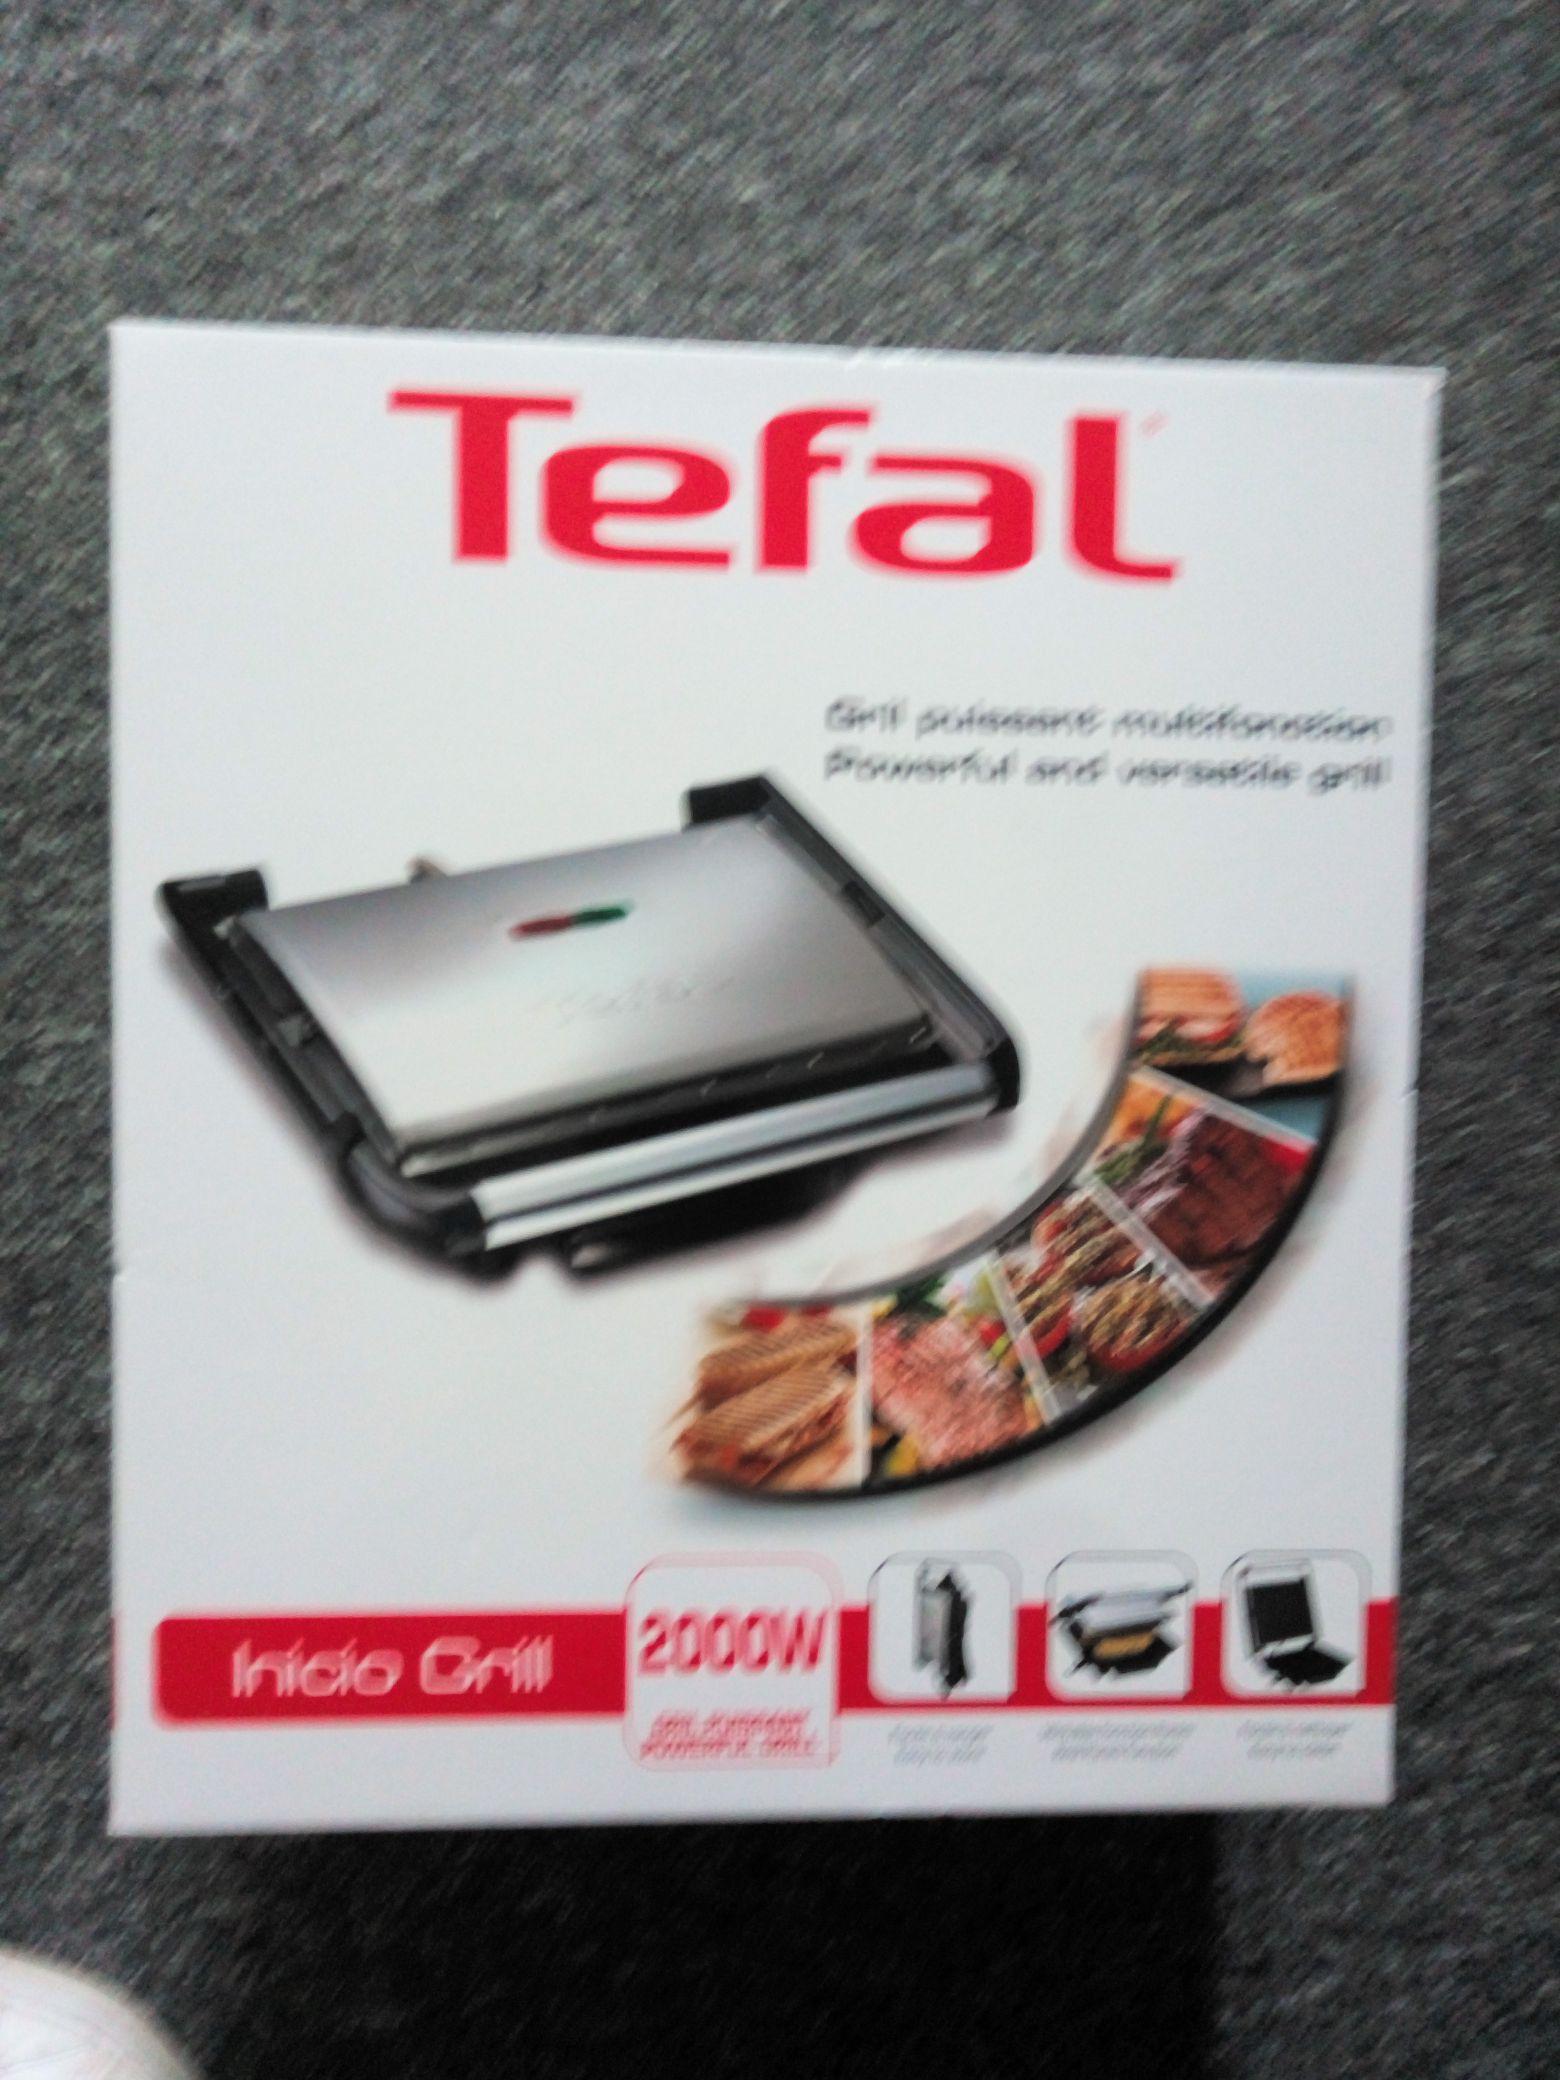 Tefal Inicio grill - £12.50 instore @ Tesco